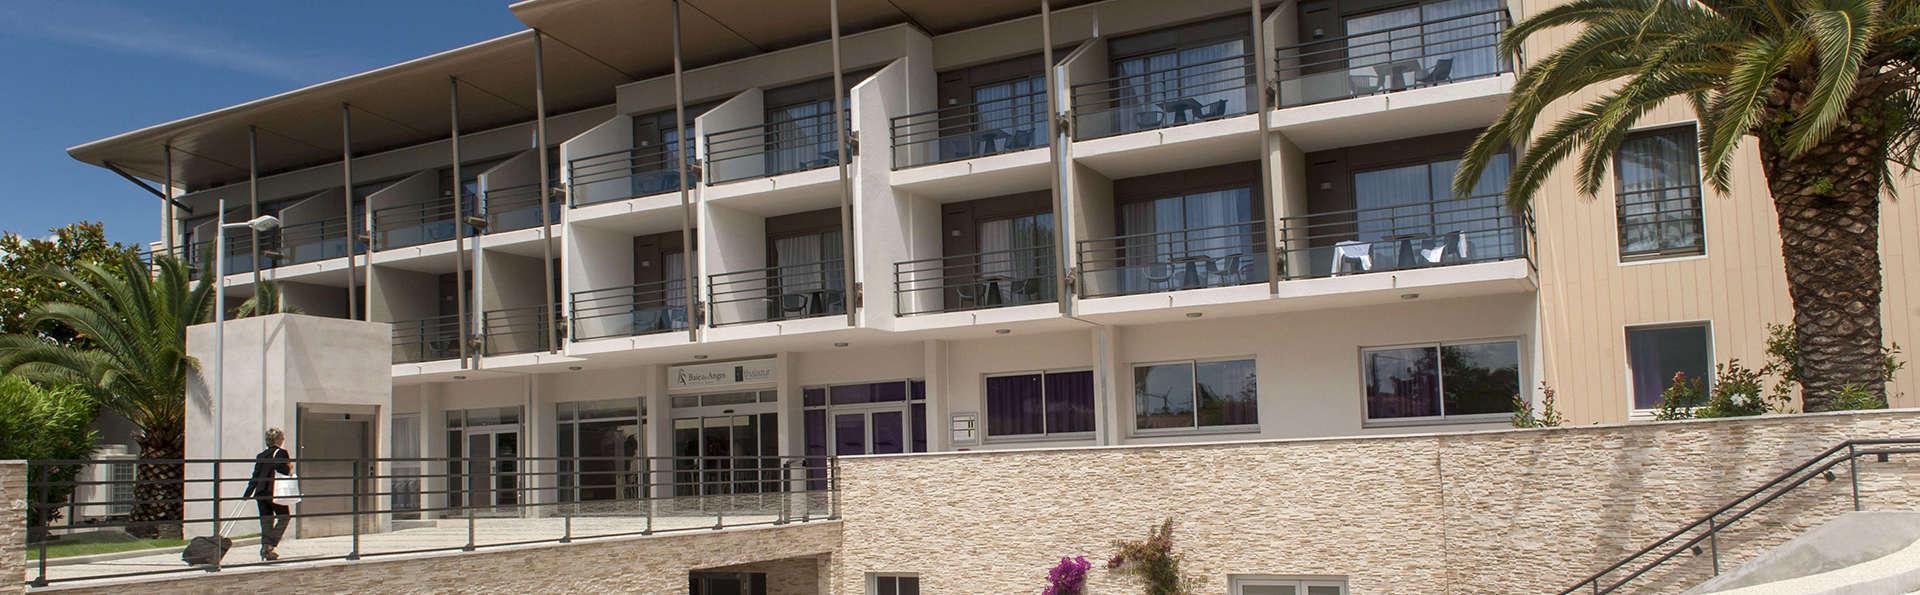 Hôtel Baie des Anges by Thalazur - edit_facade2.jpg